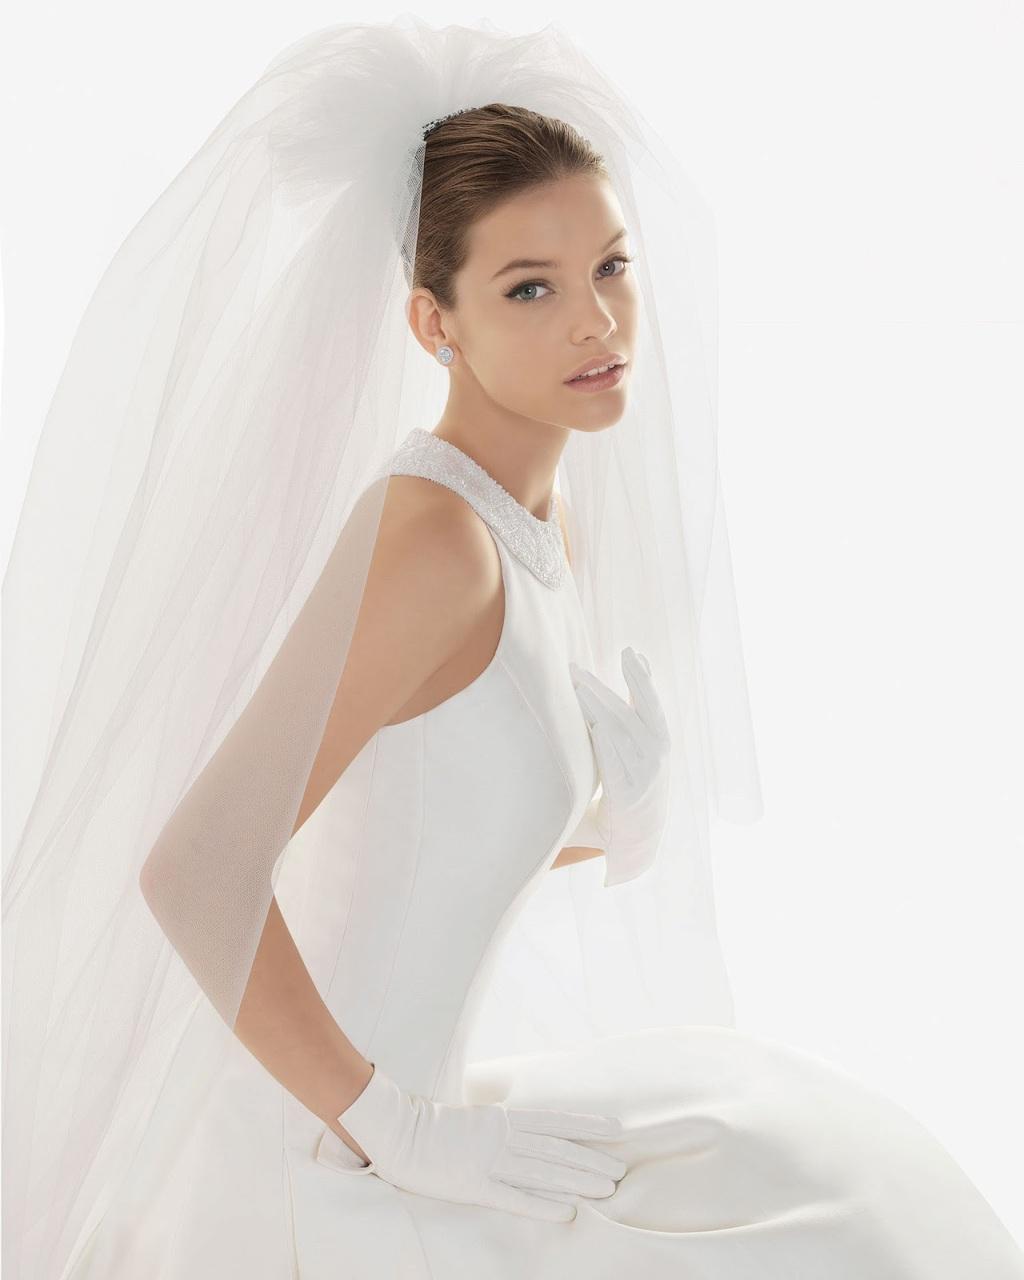 Rosa-clara-wedding-dress-spring-2014-bridal-1.full